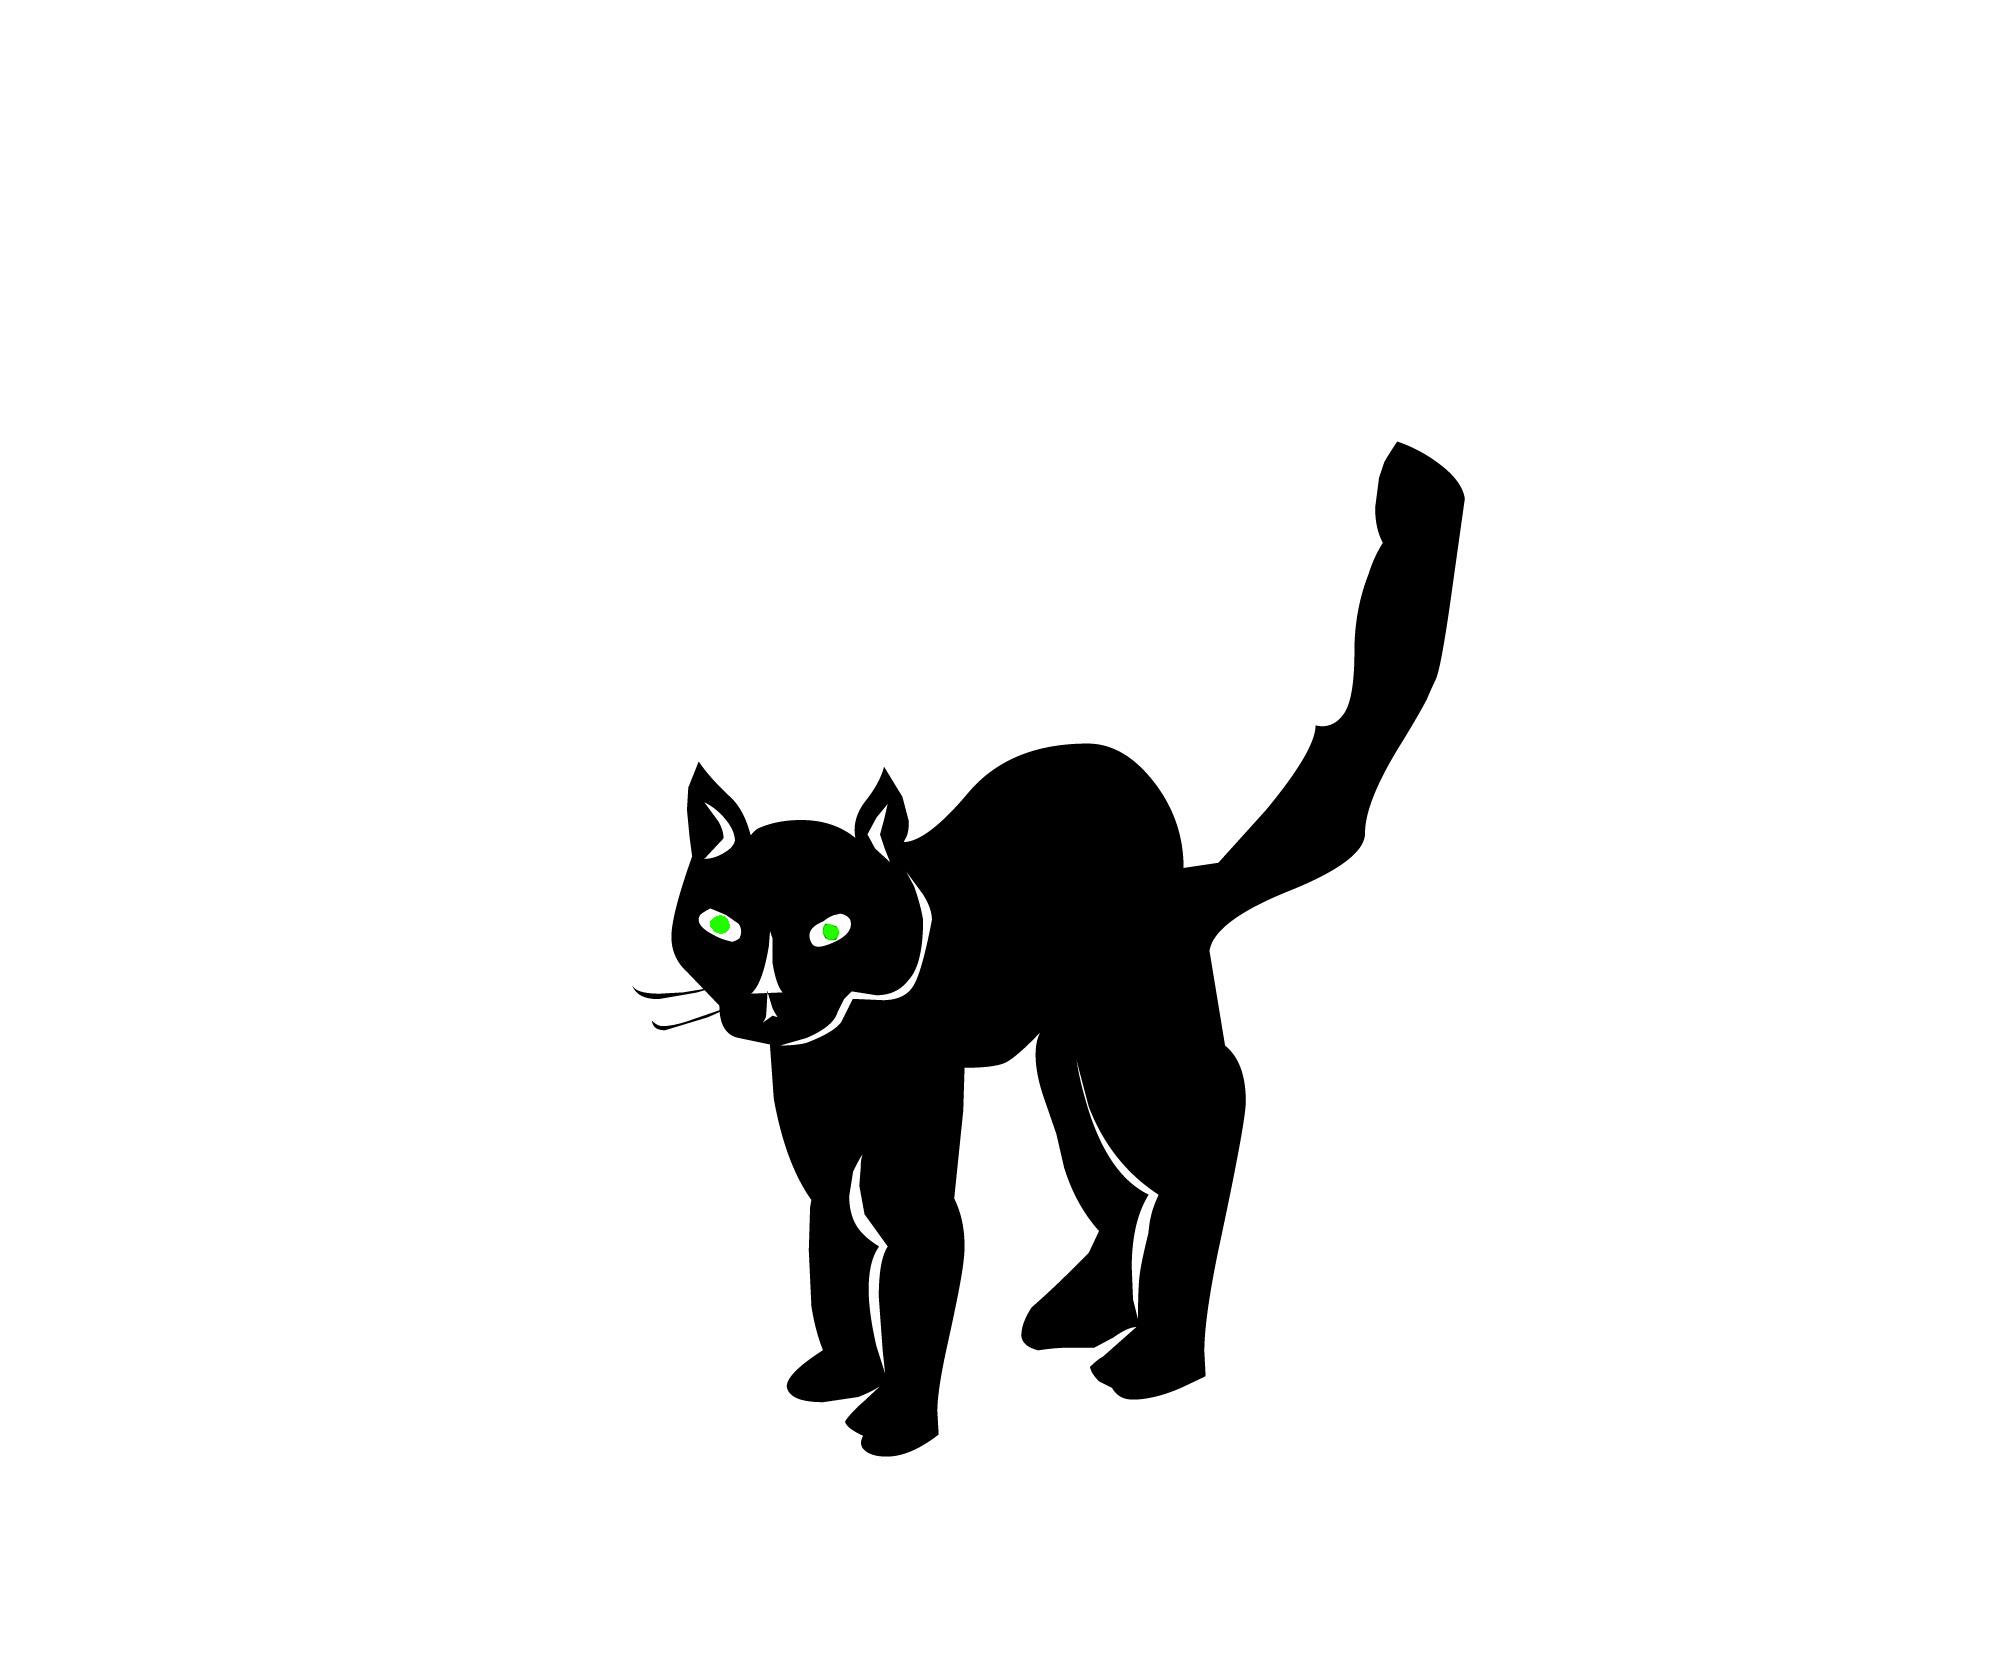 Black Cat Clip Art Free - ClipArt Best (1991 x 1674 Pixel)